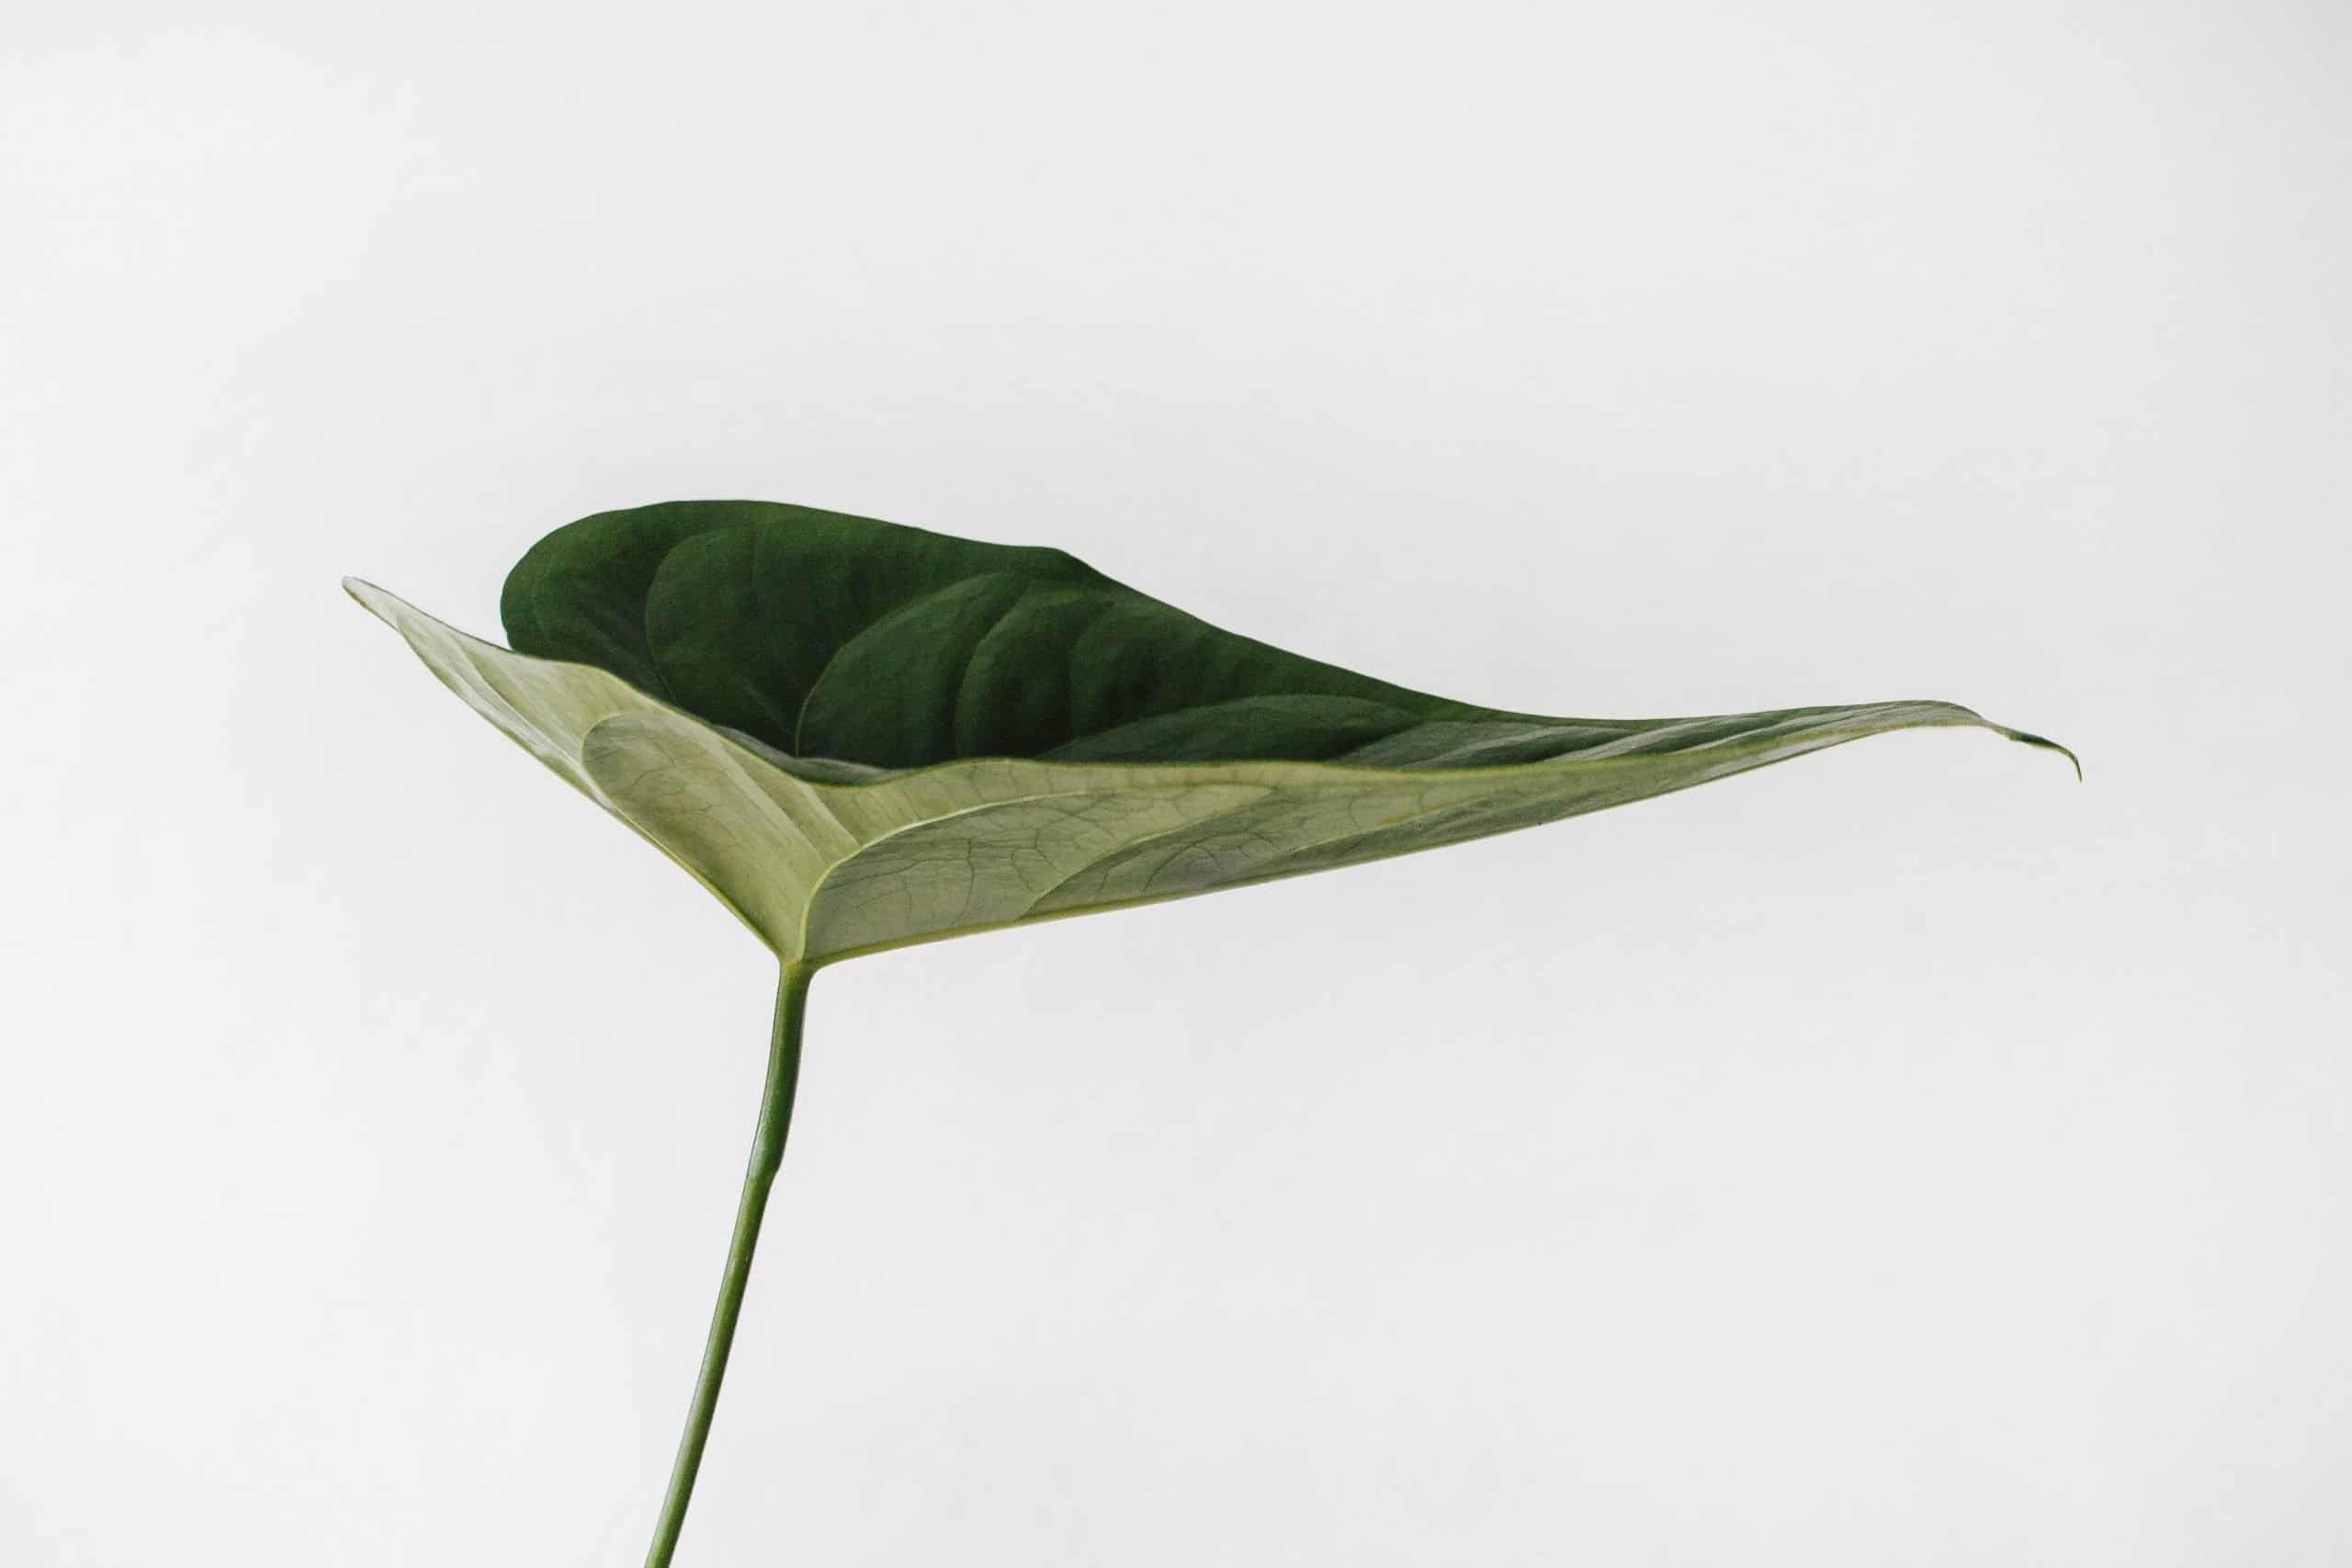 close image of a plant leaf.